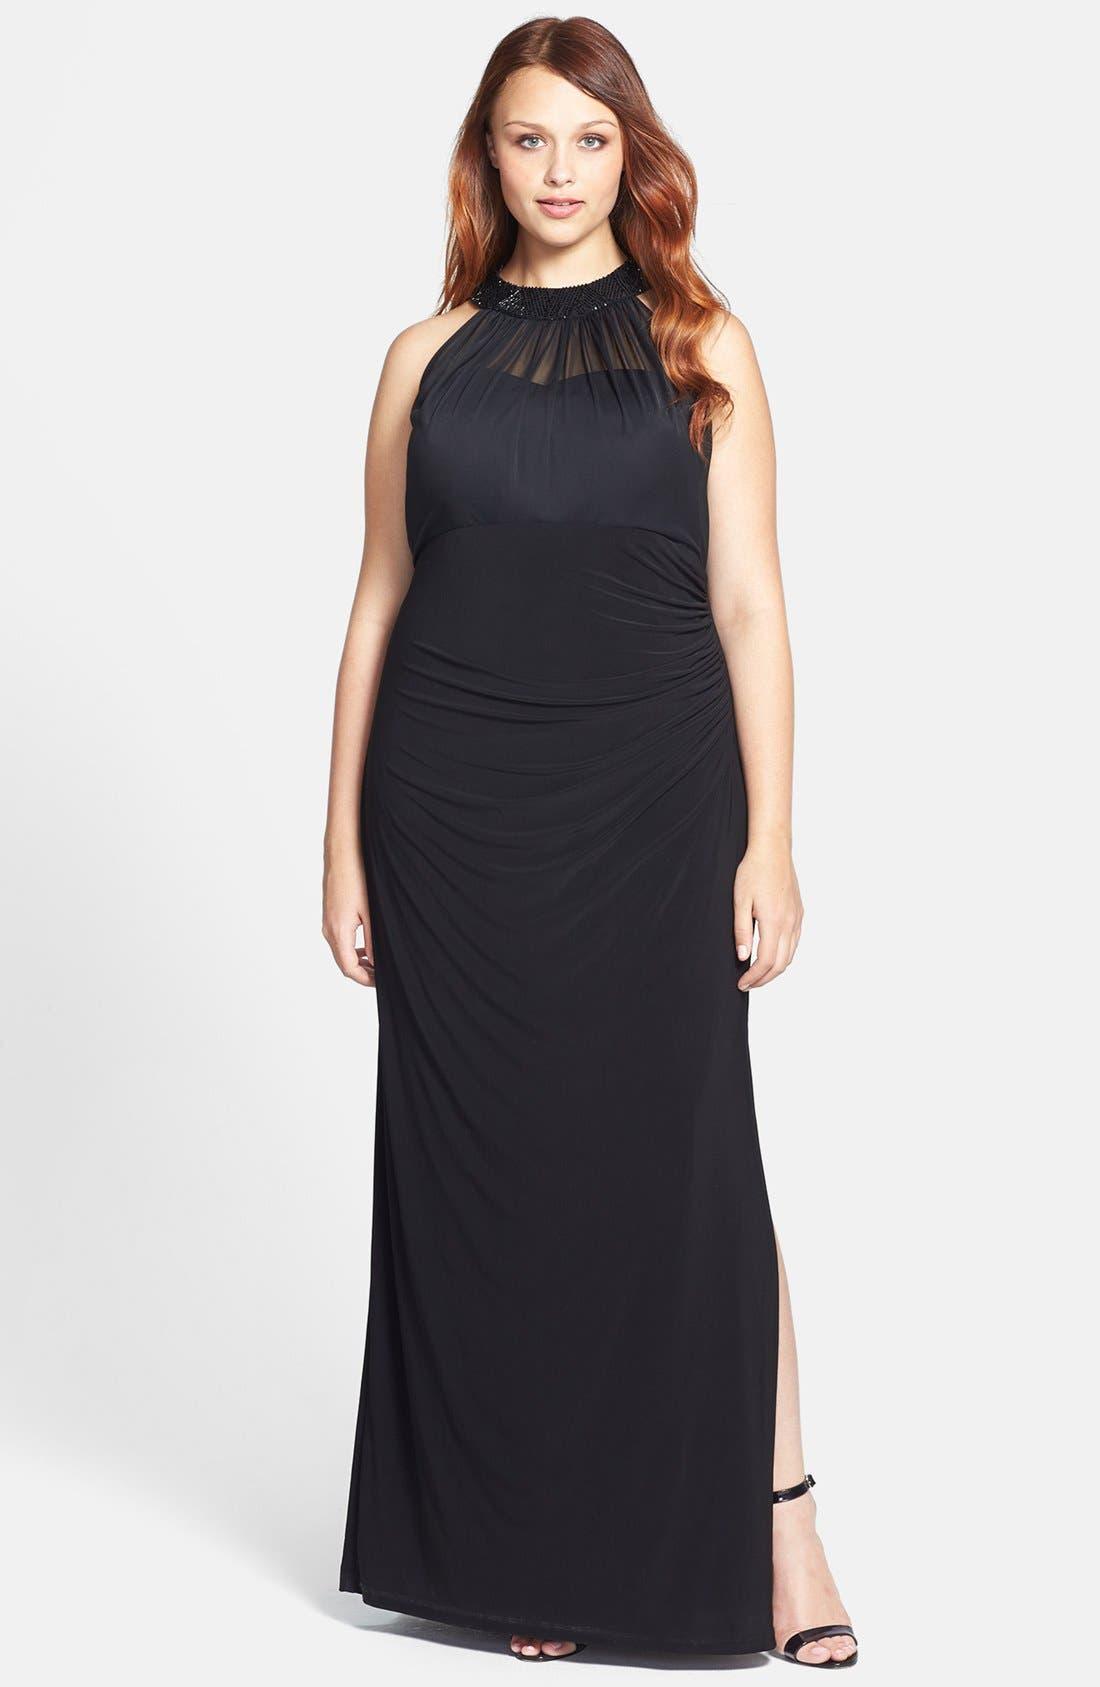 Main Image - Xscape Long Stretch Knit Dress (Plus Size)